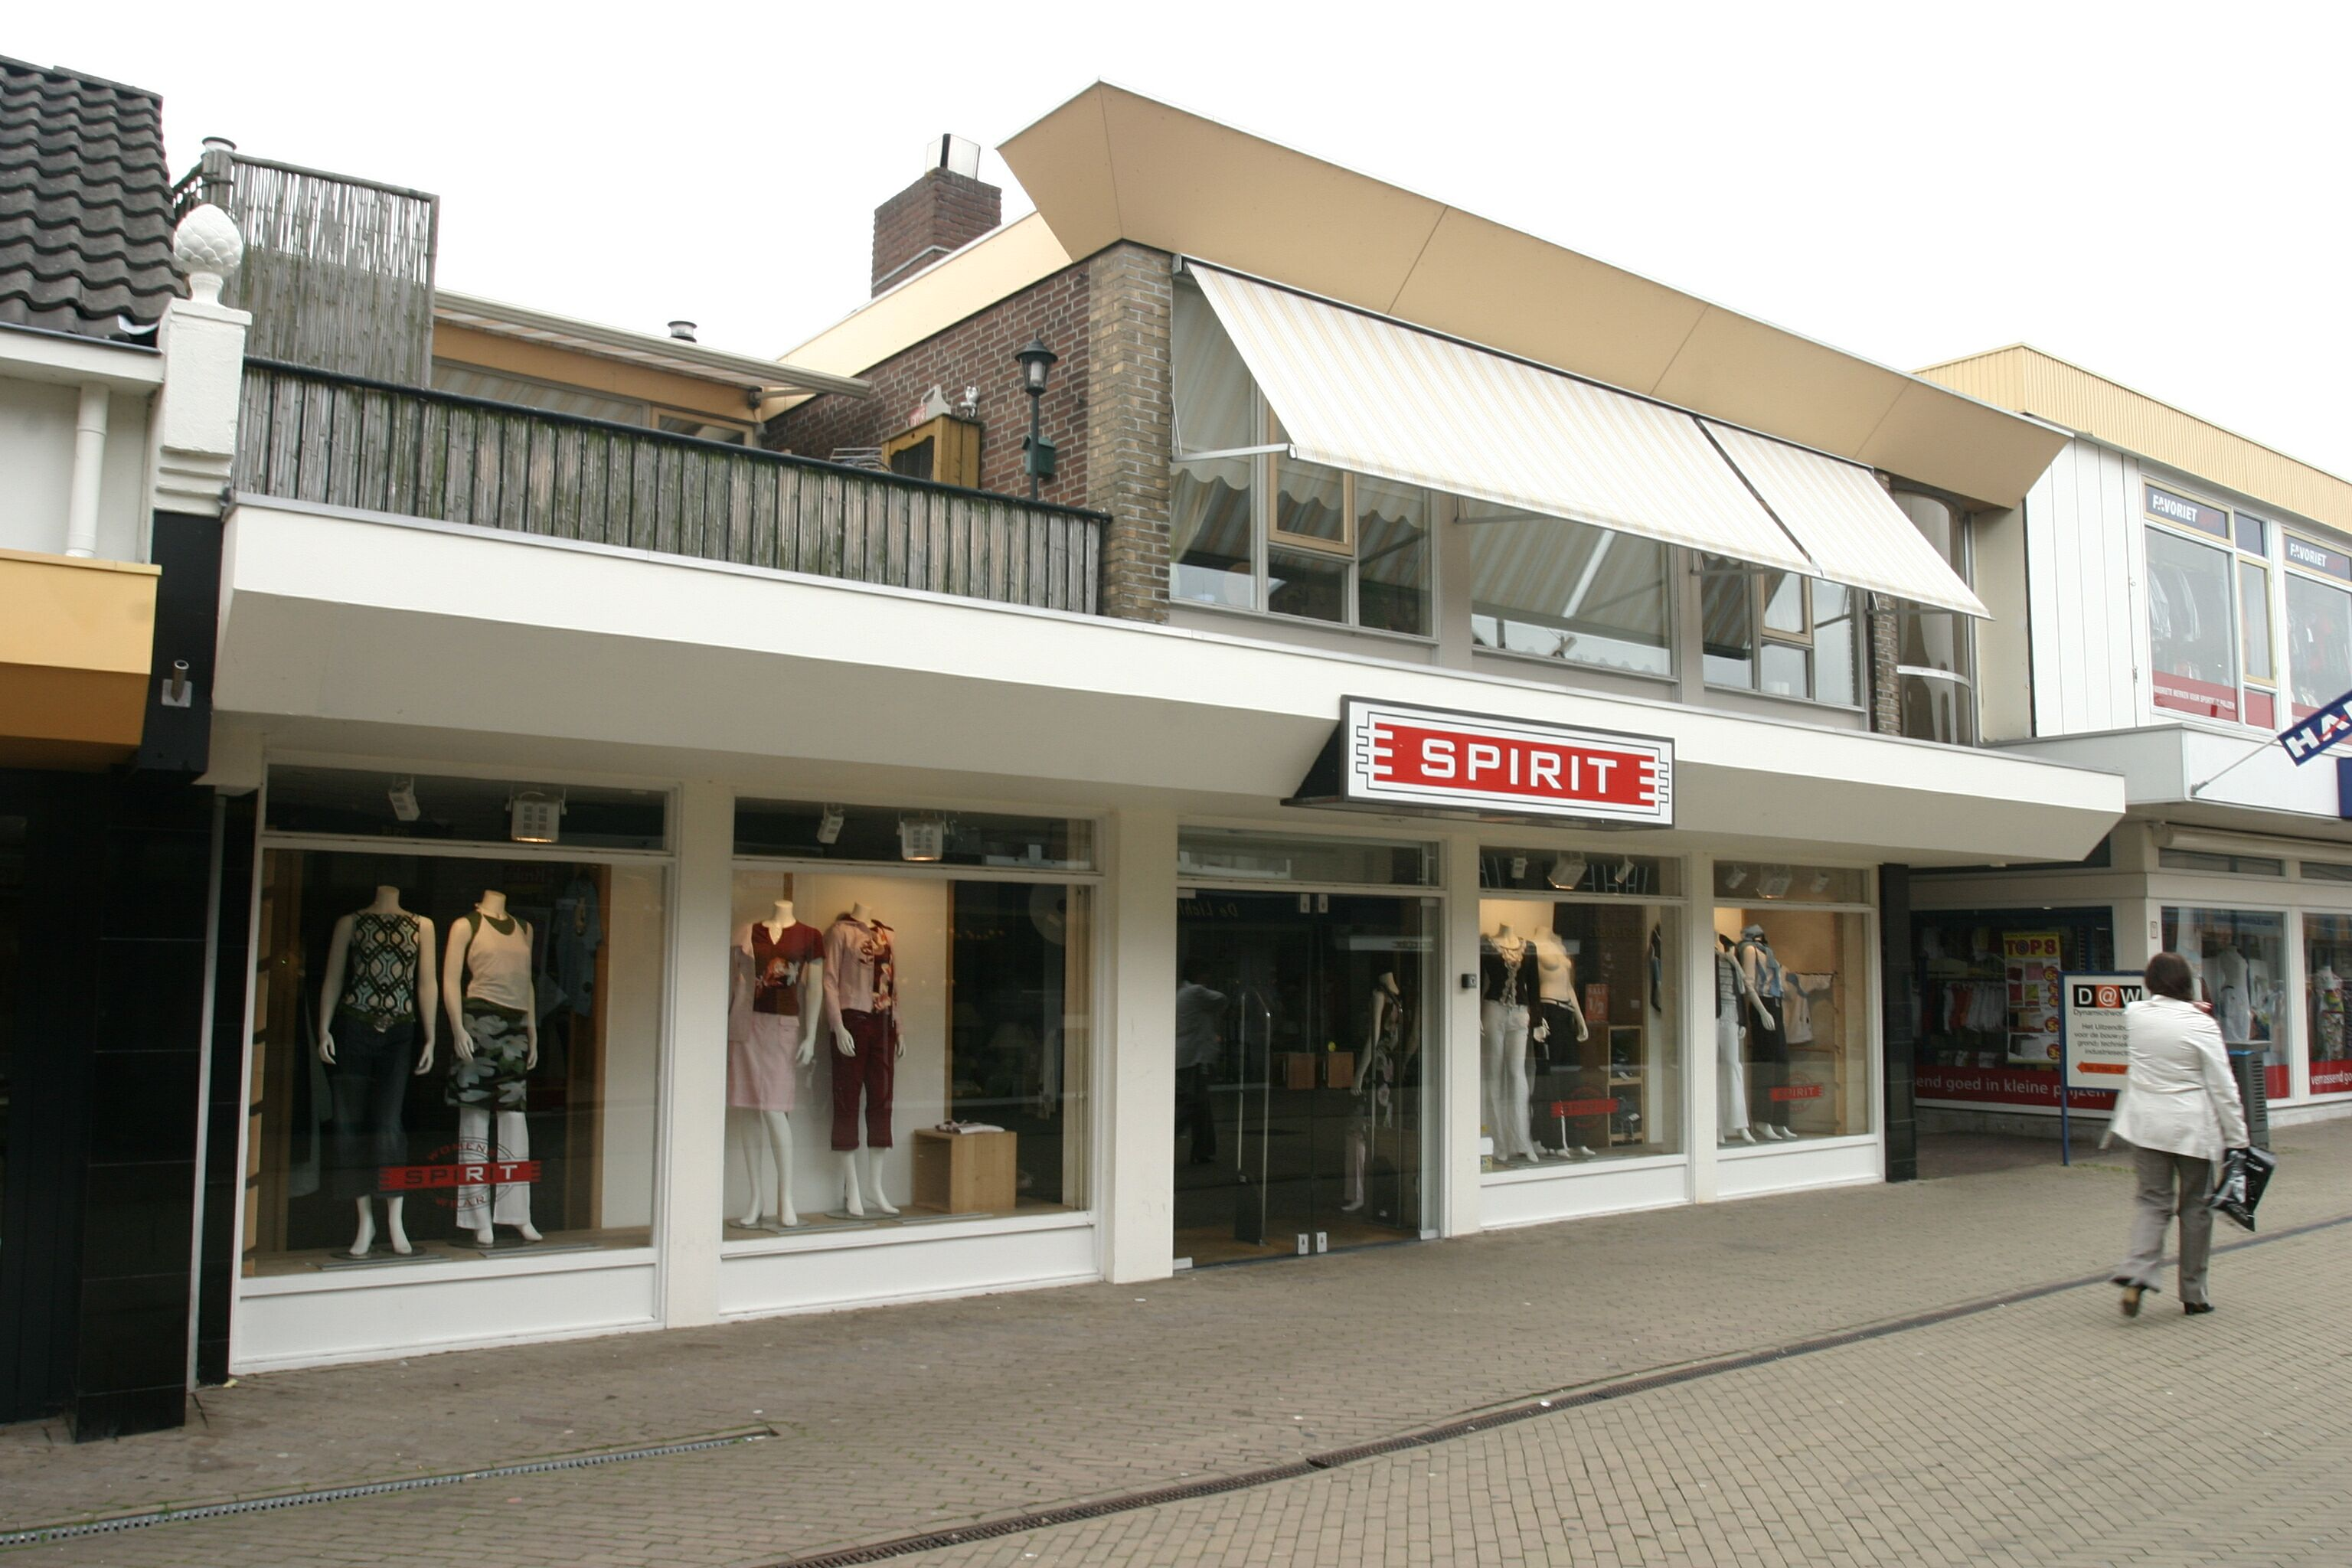 Winkel Kerkbuurt Sliedrecht